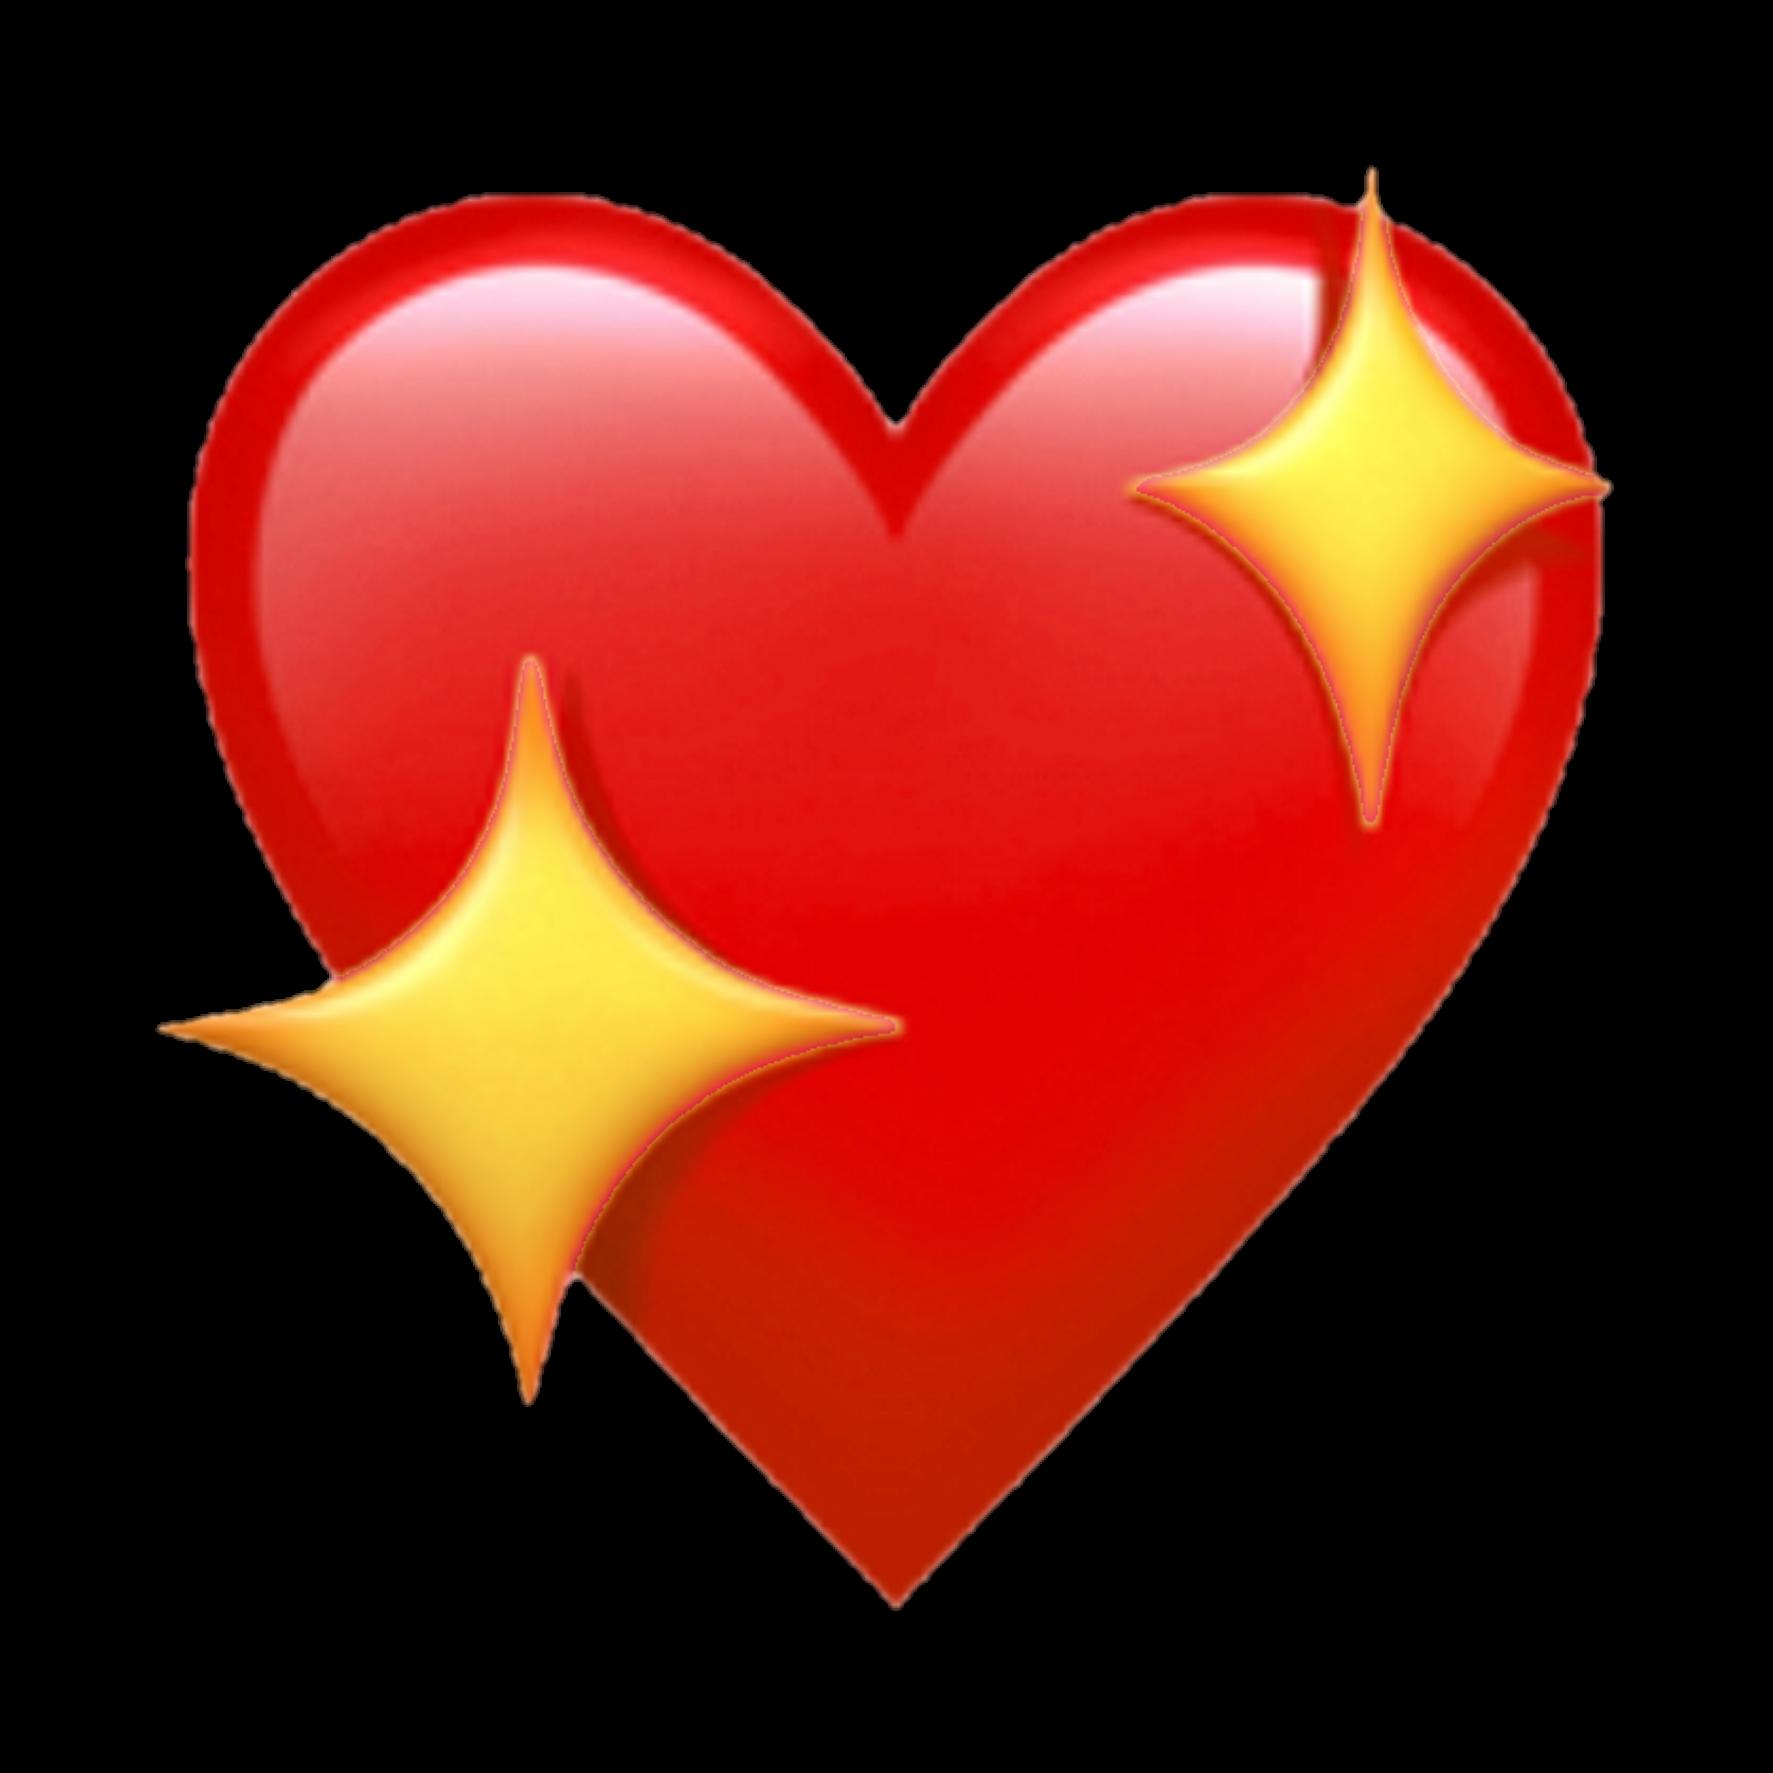 Redemoji Red Heart Redheart Emoji Apple Heartemoji Remi